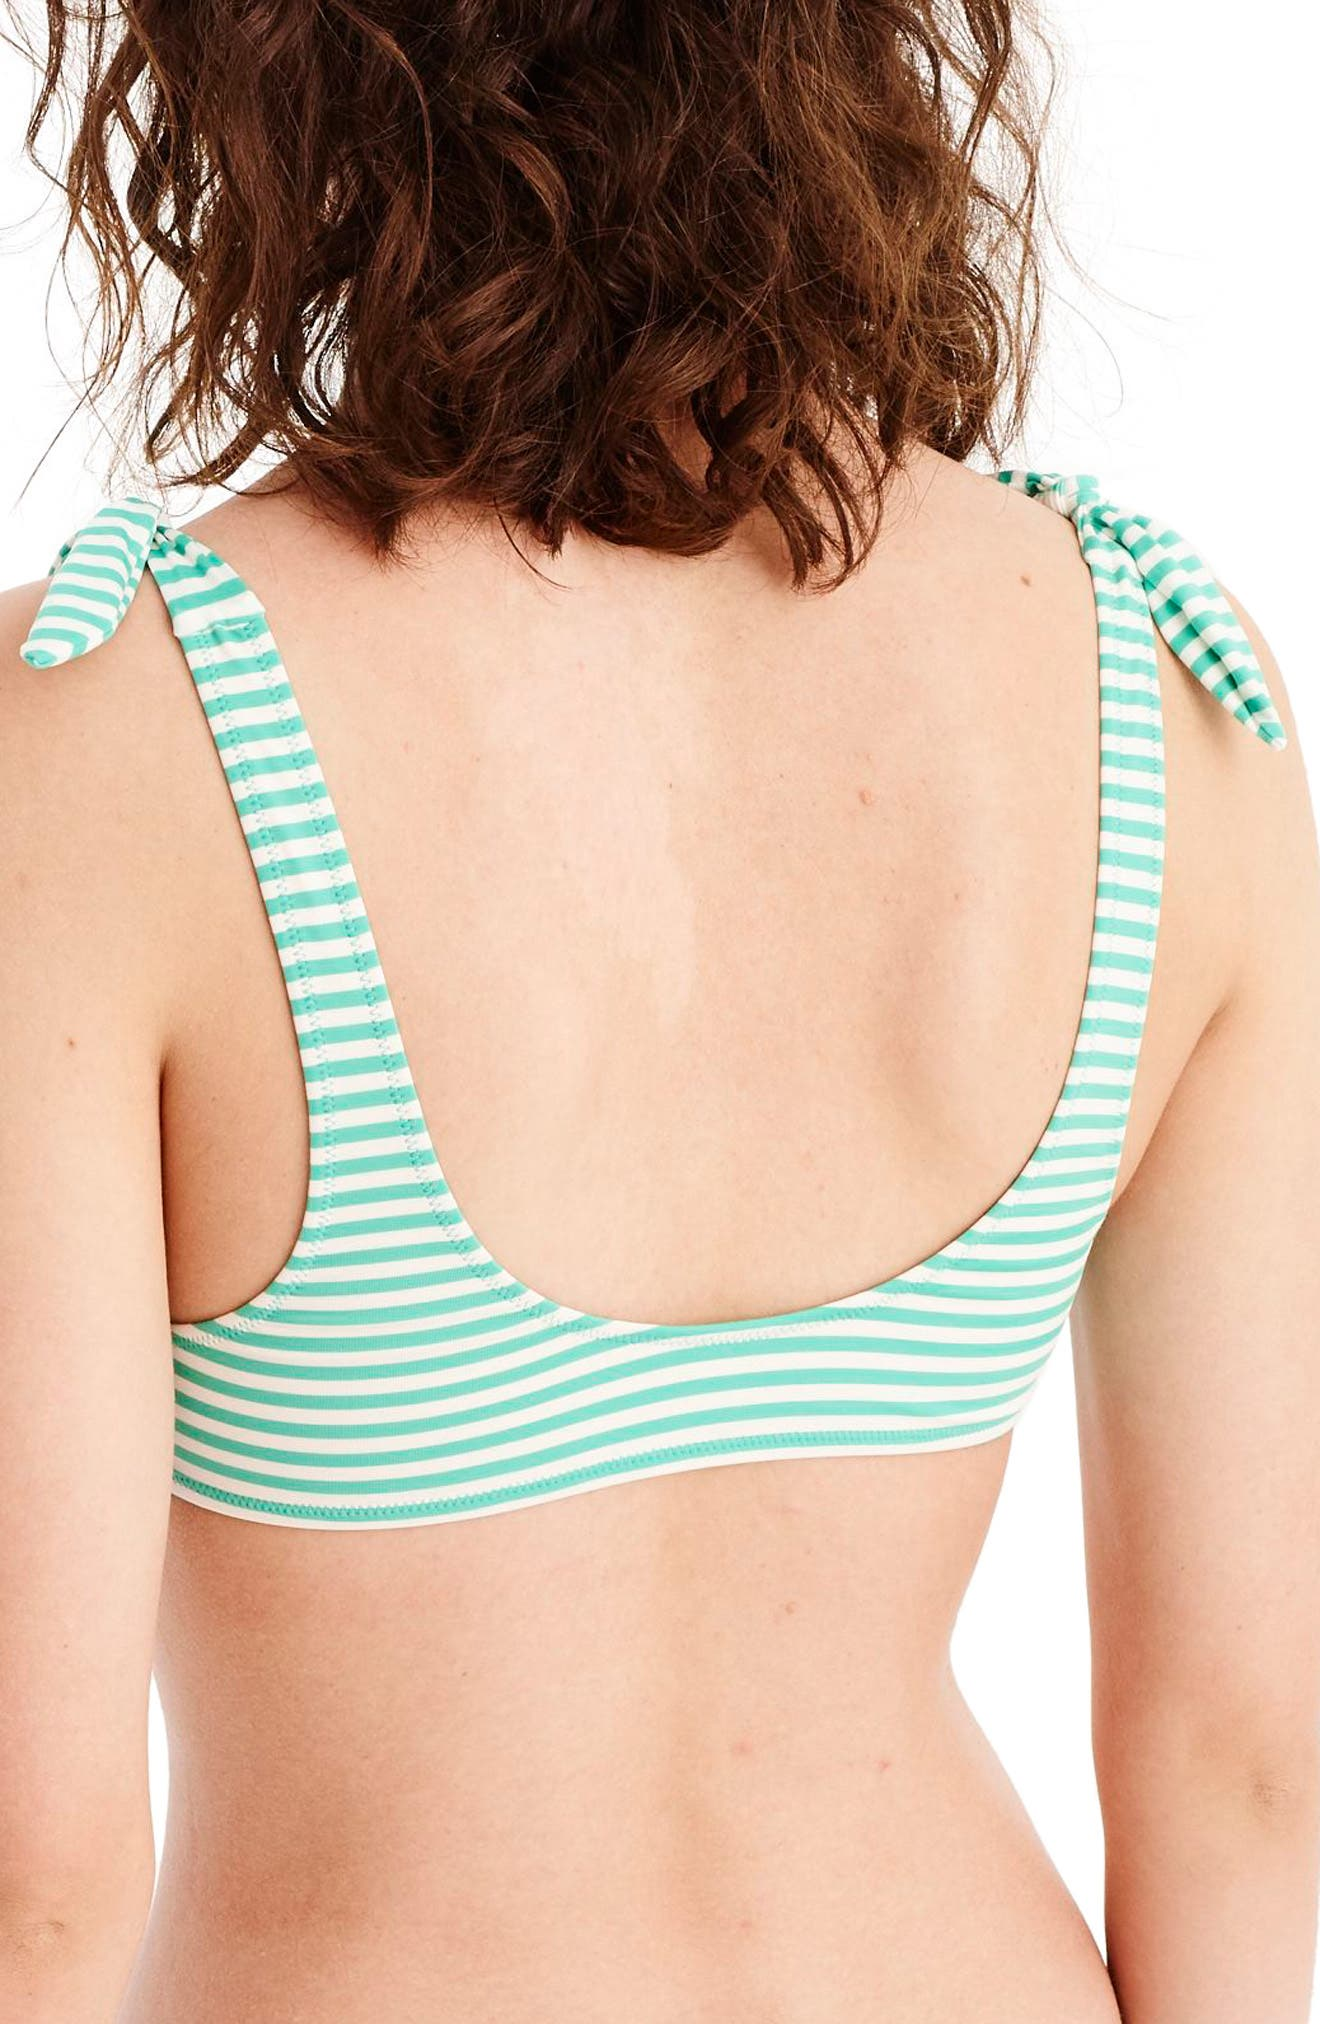 Playa Nantucket Bikini Top,                             Alternate thumbnail 2, color,                             Bright Patina Ivory